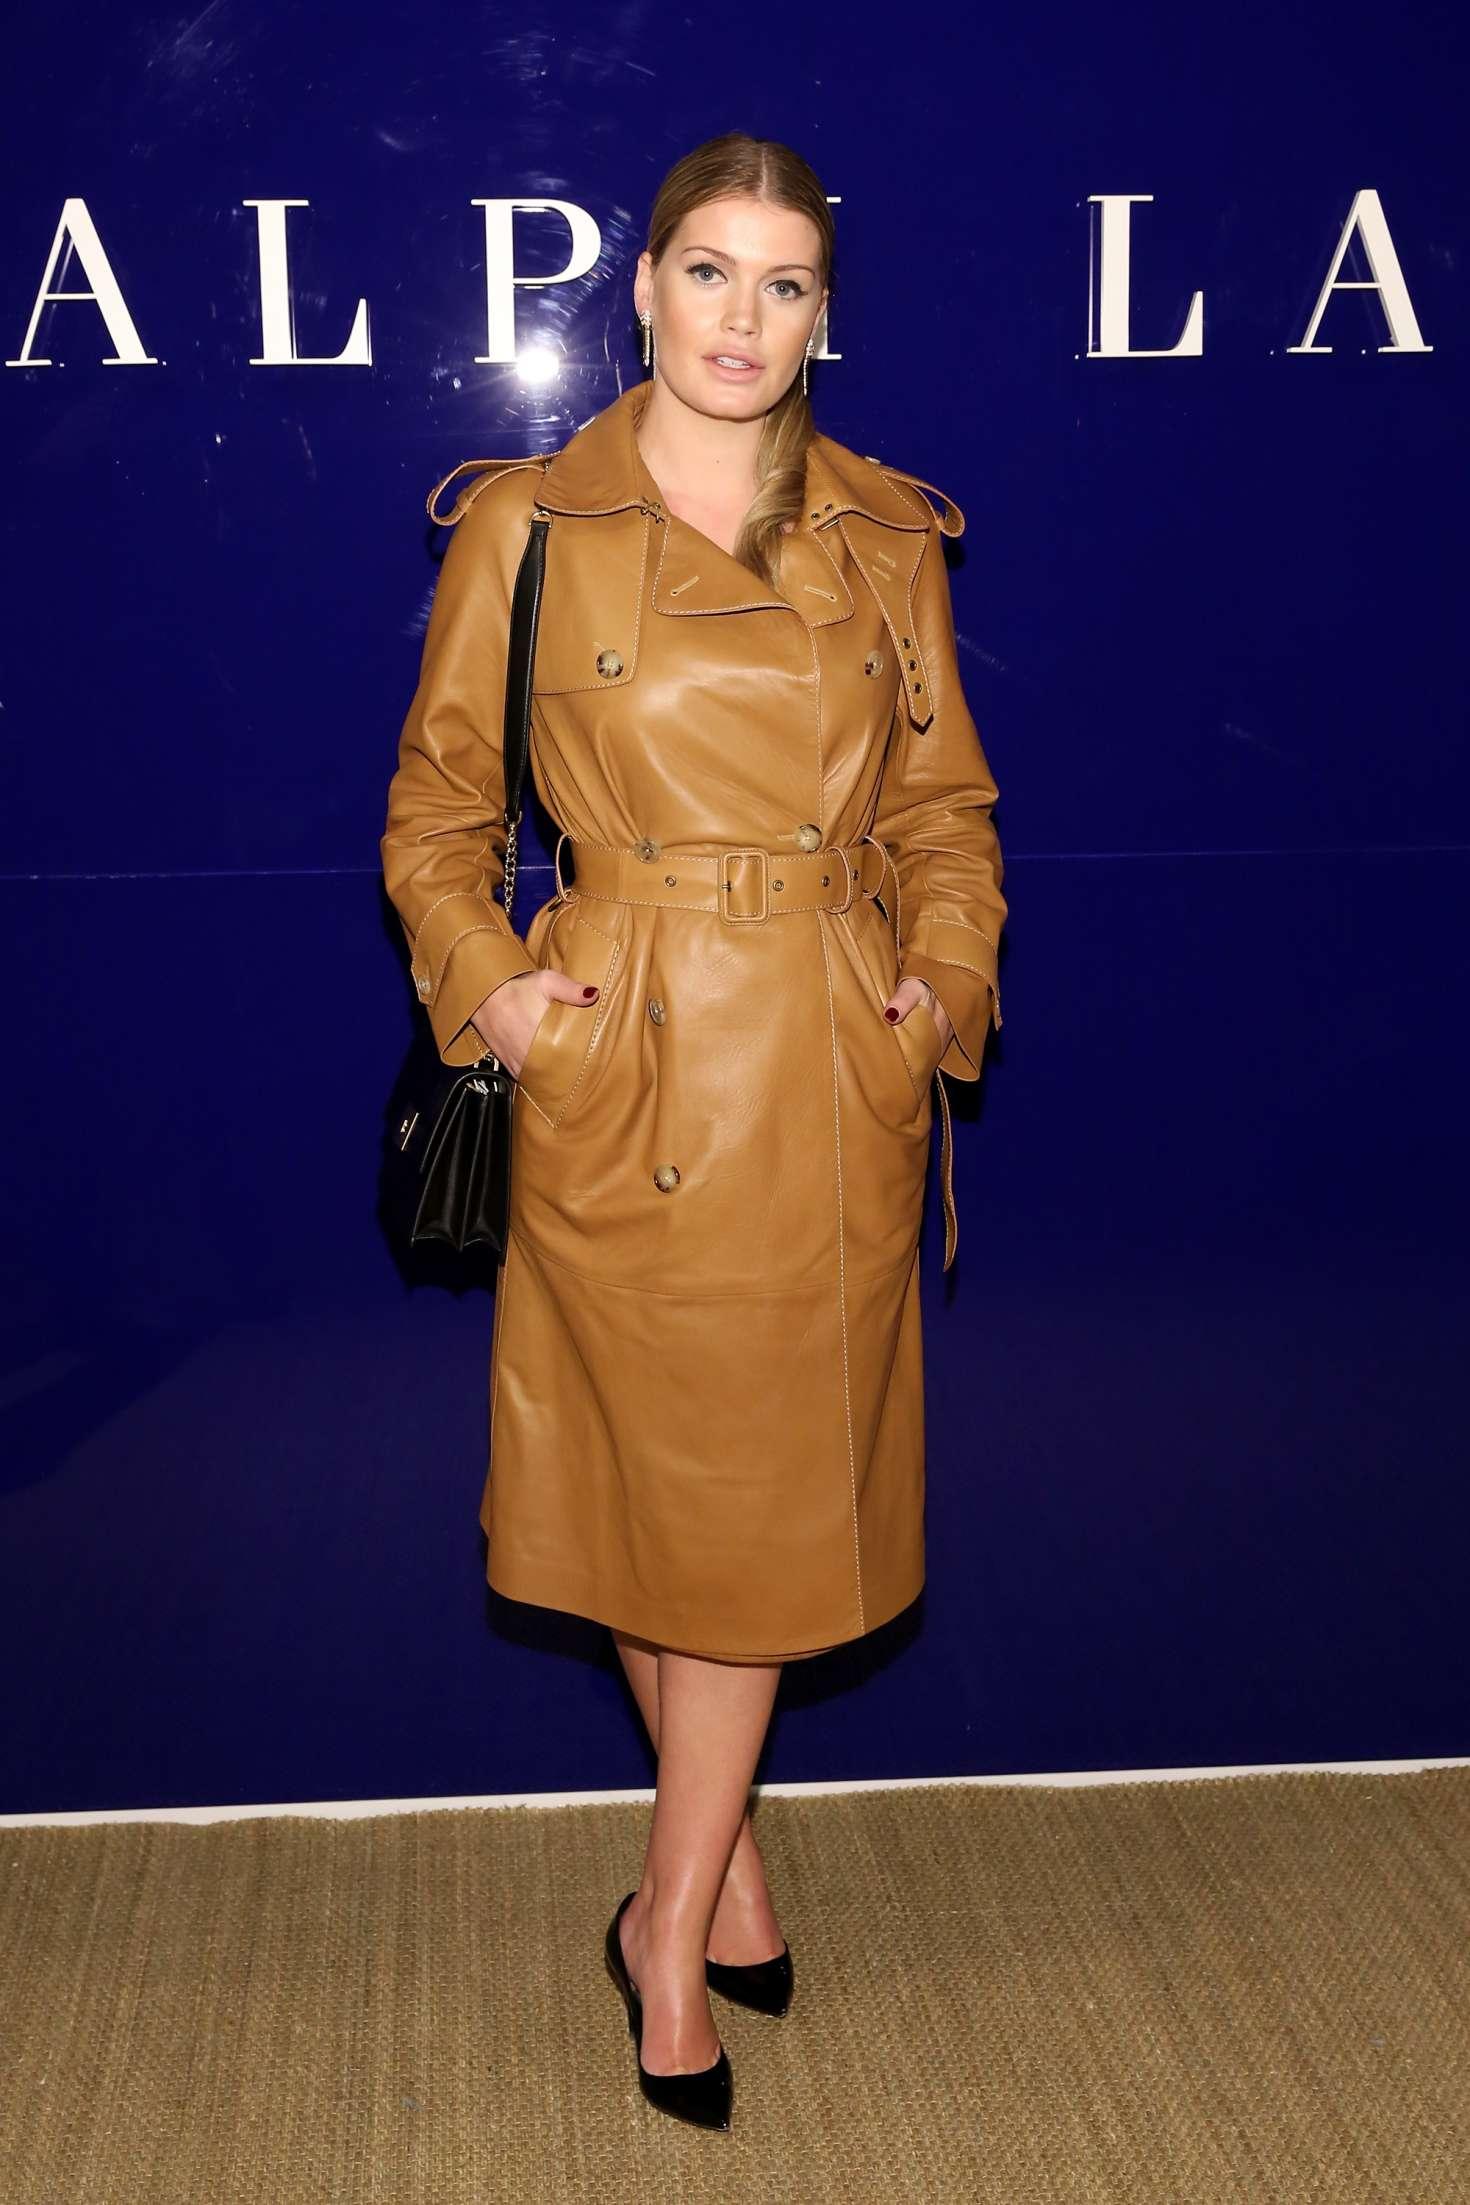 Kitty Spencer Ralph Lauren Fashion Show 2018 In New York